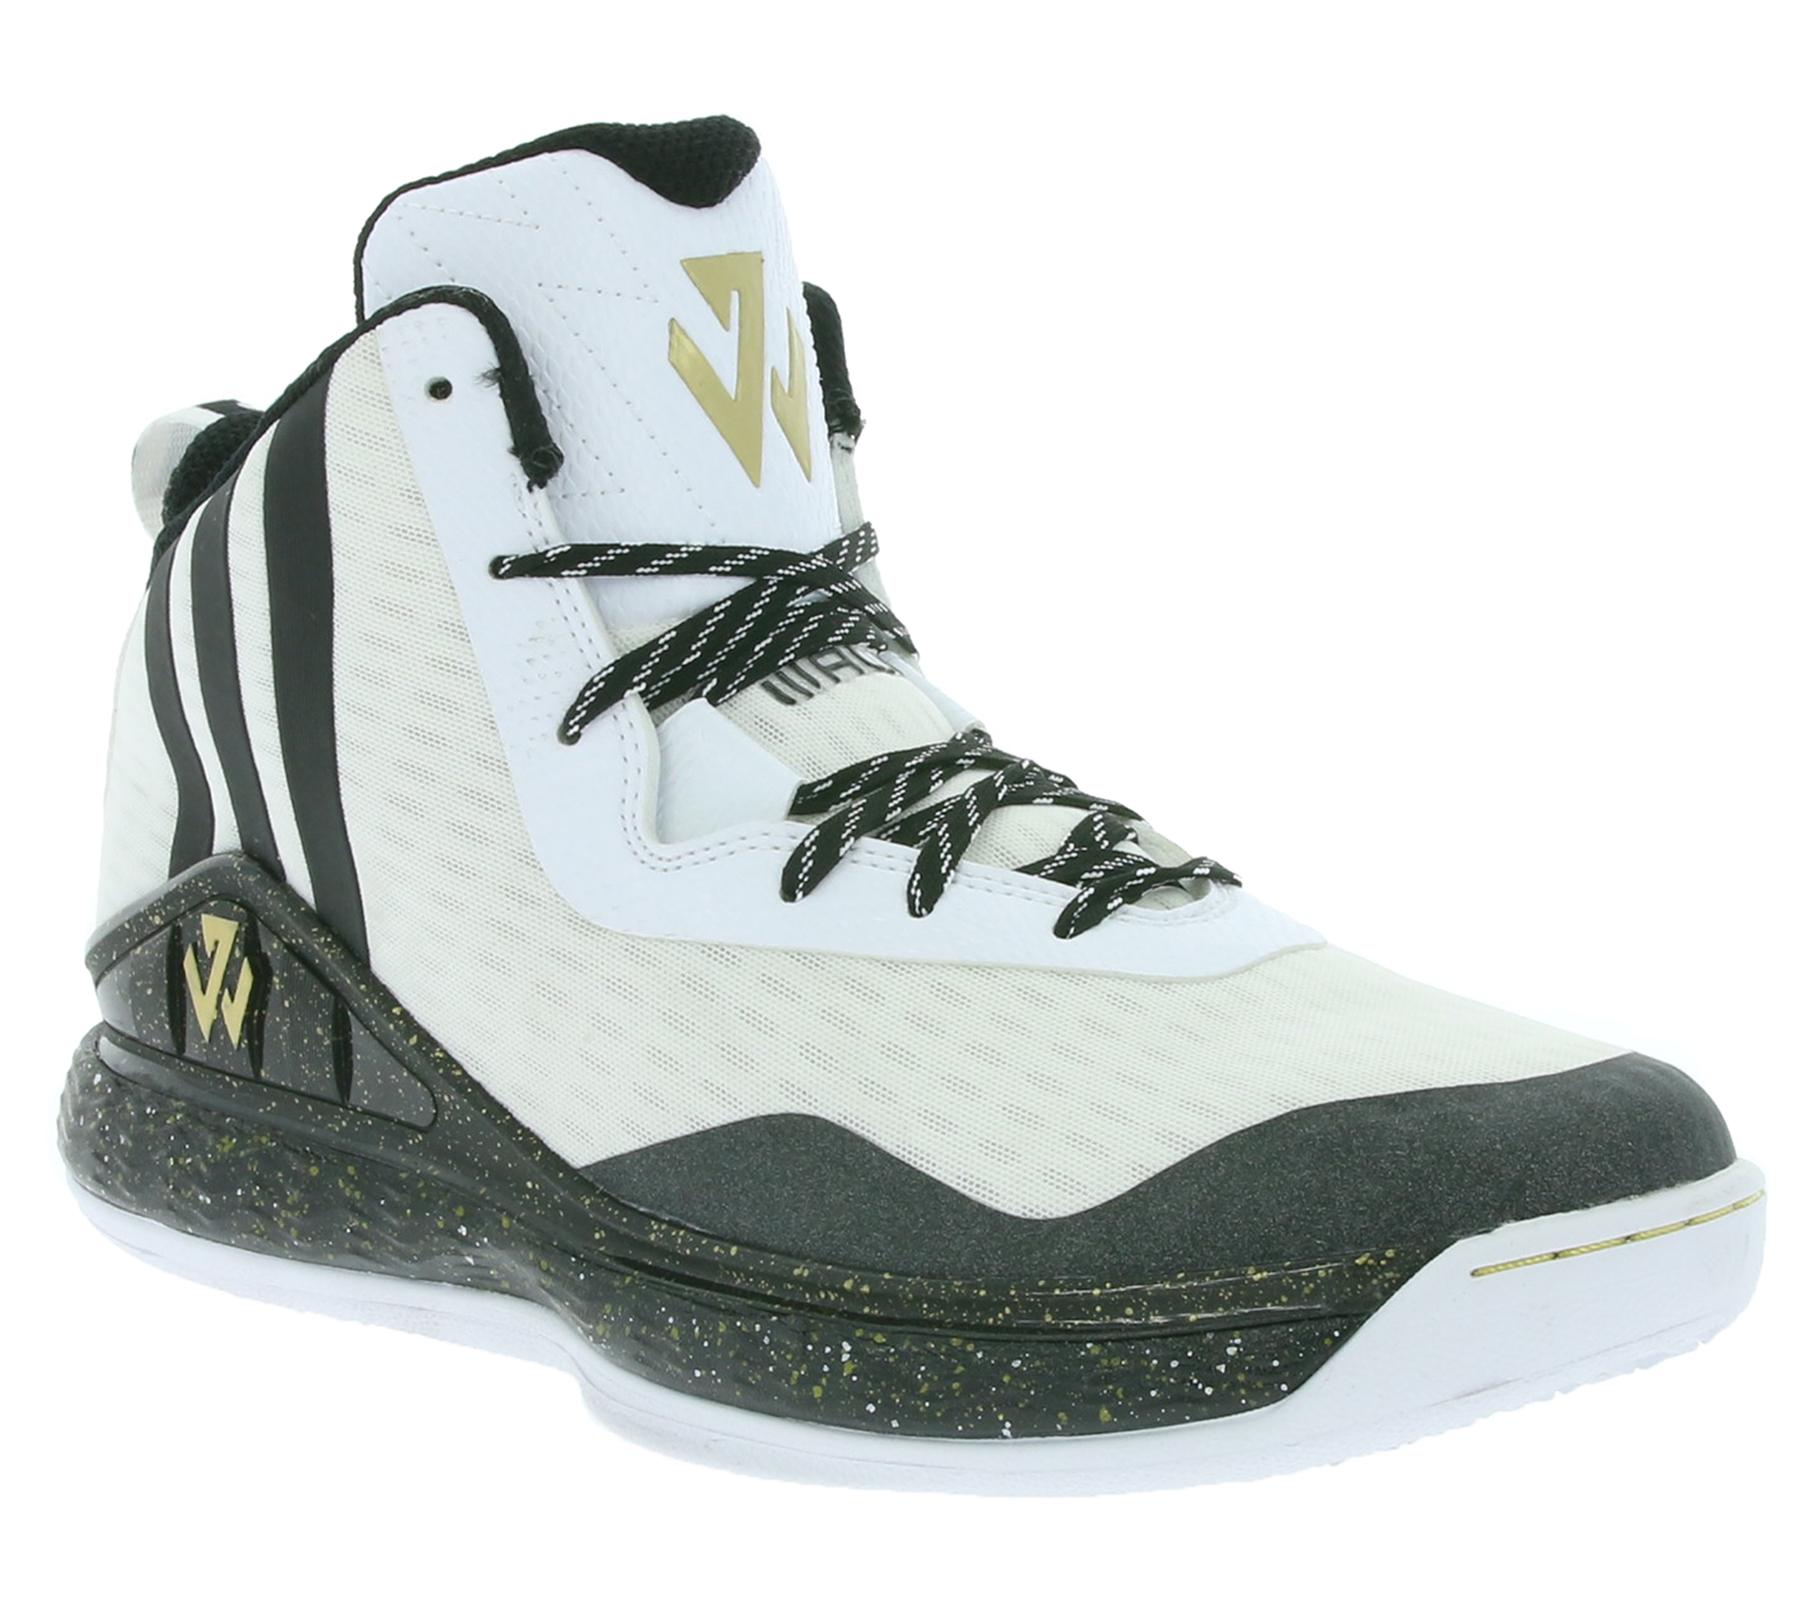 J Wall Adidas Basketballschuhe/ 34,99€/ Outlet46